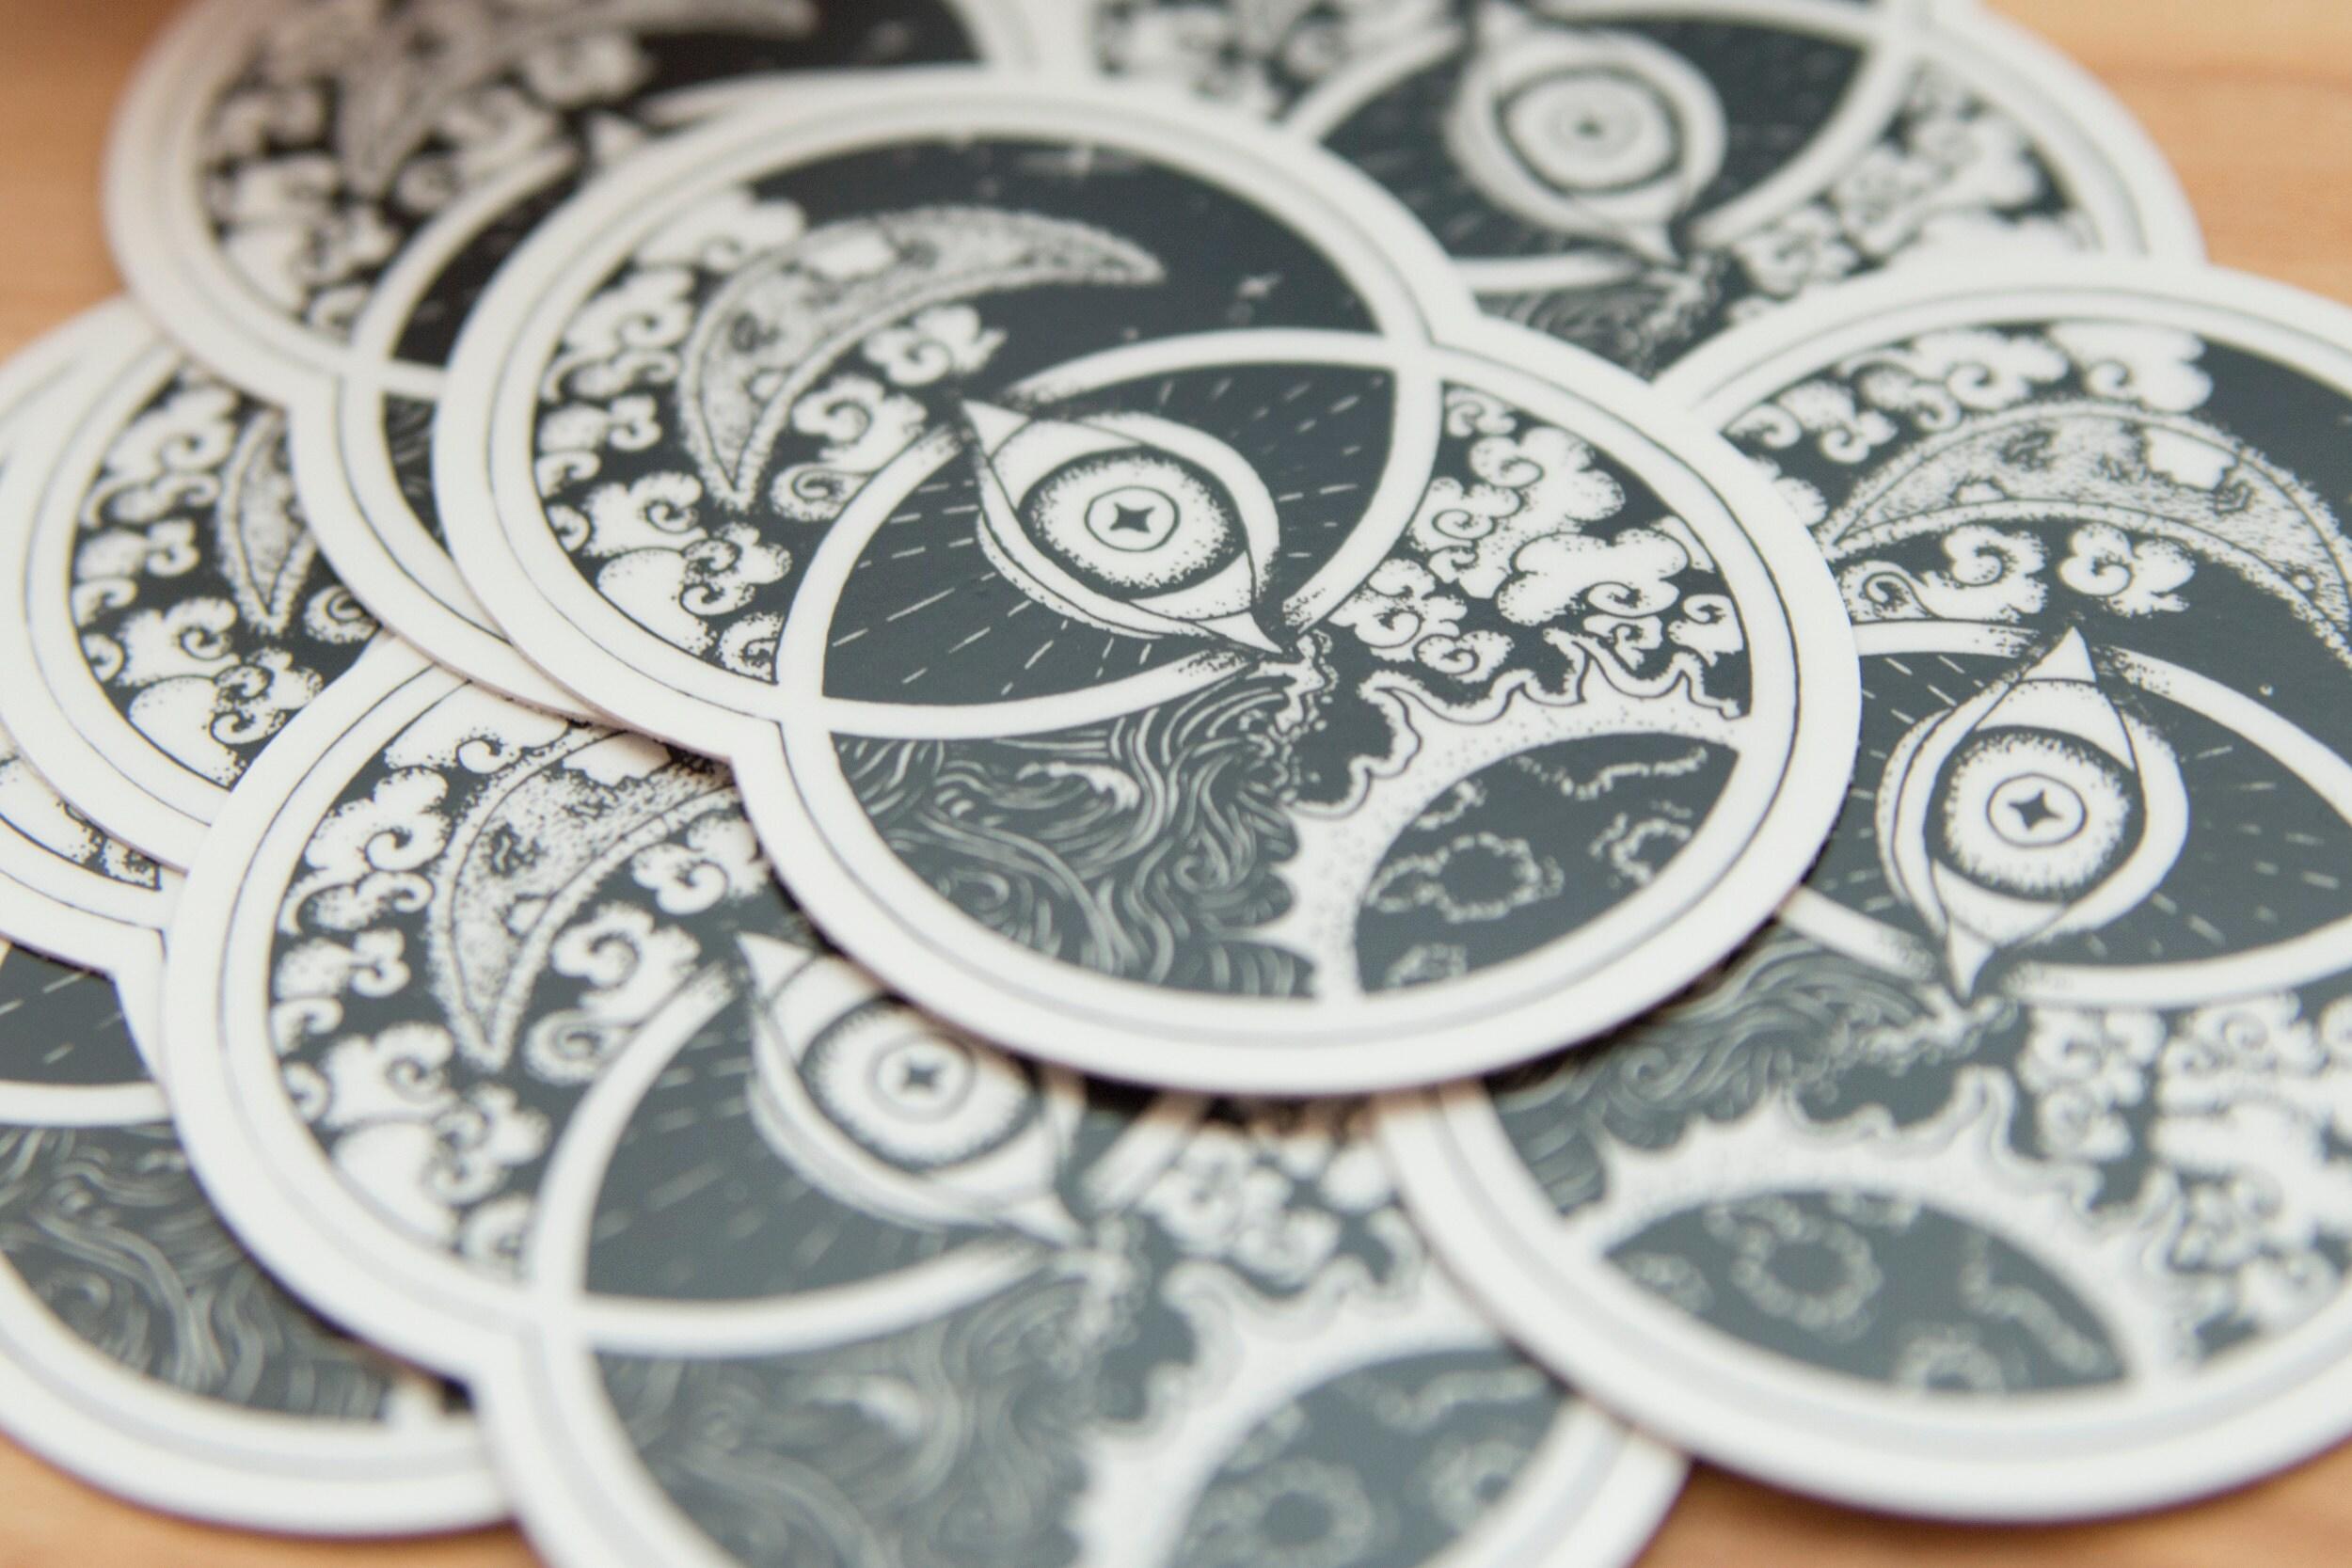 vesica piscis, sticker, sacred geometry, all seeing eye, premium vinyl sticker